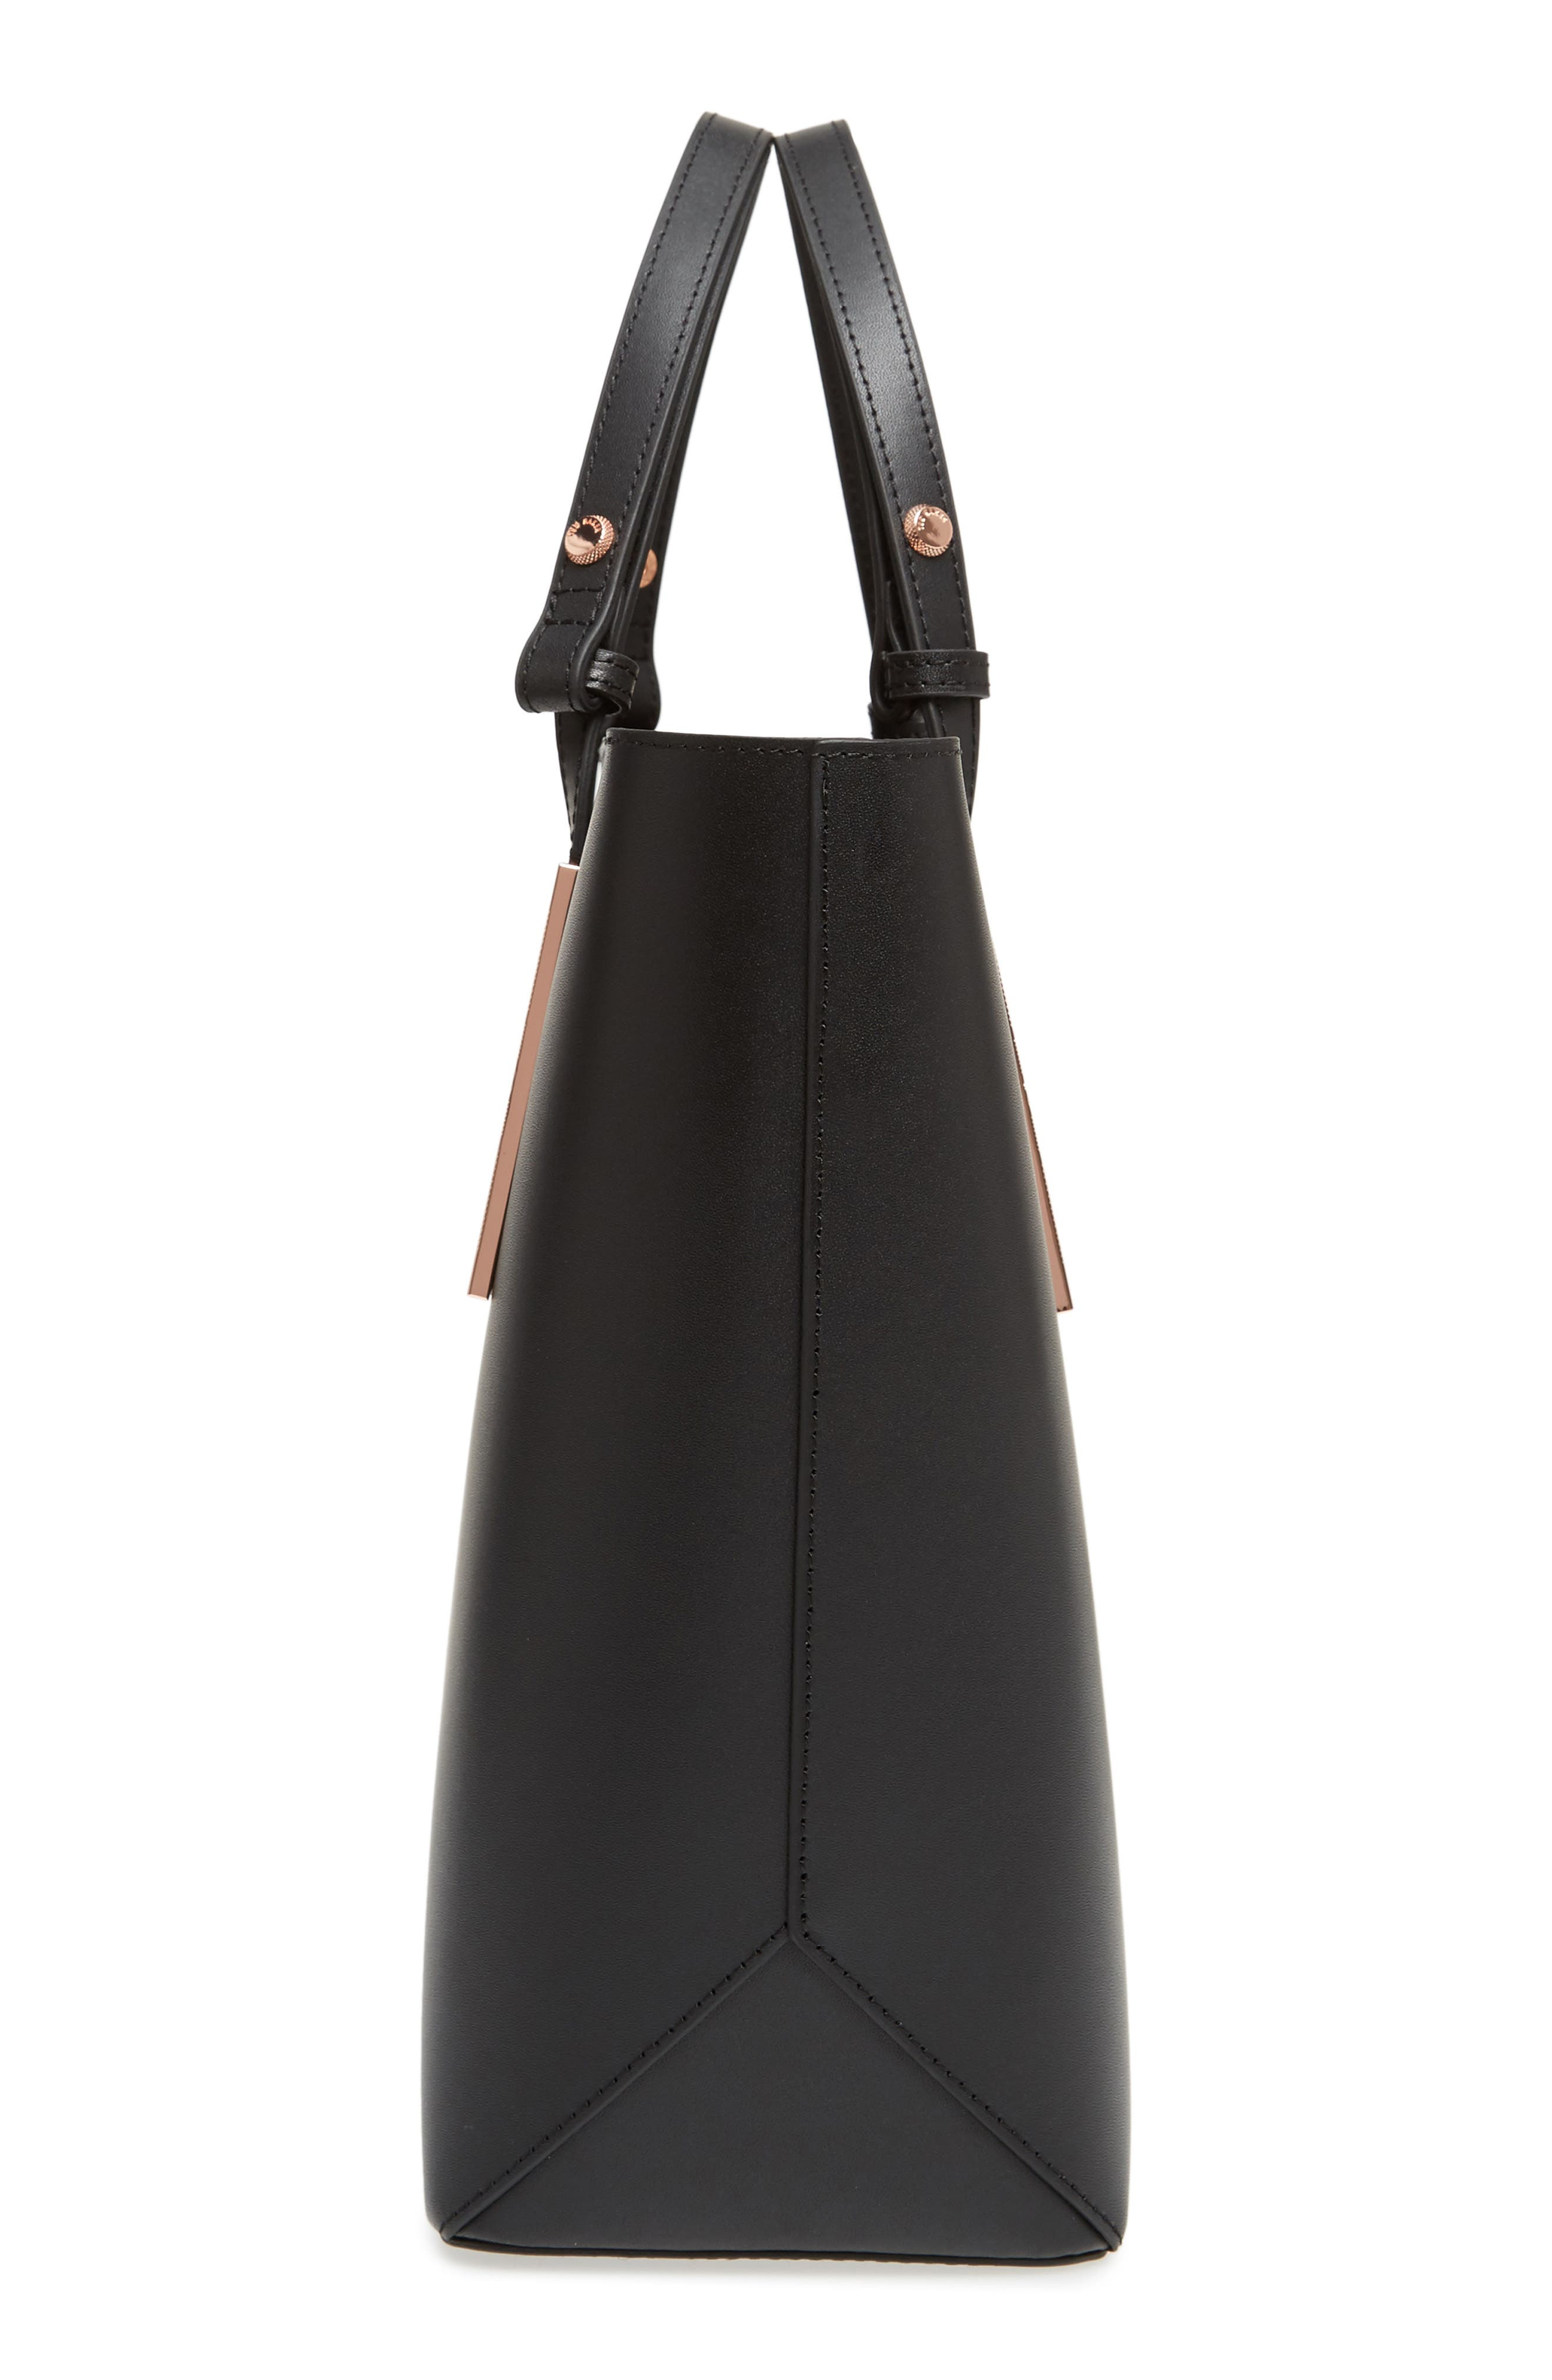 Jaceyy Adjustable Handle Leather Shopper,                             Alternate thumbnail 5, color,                             Black